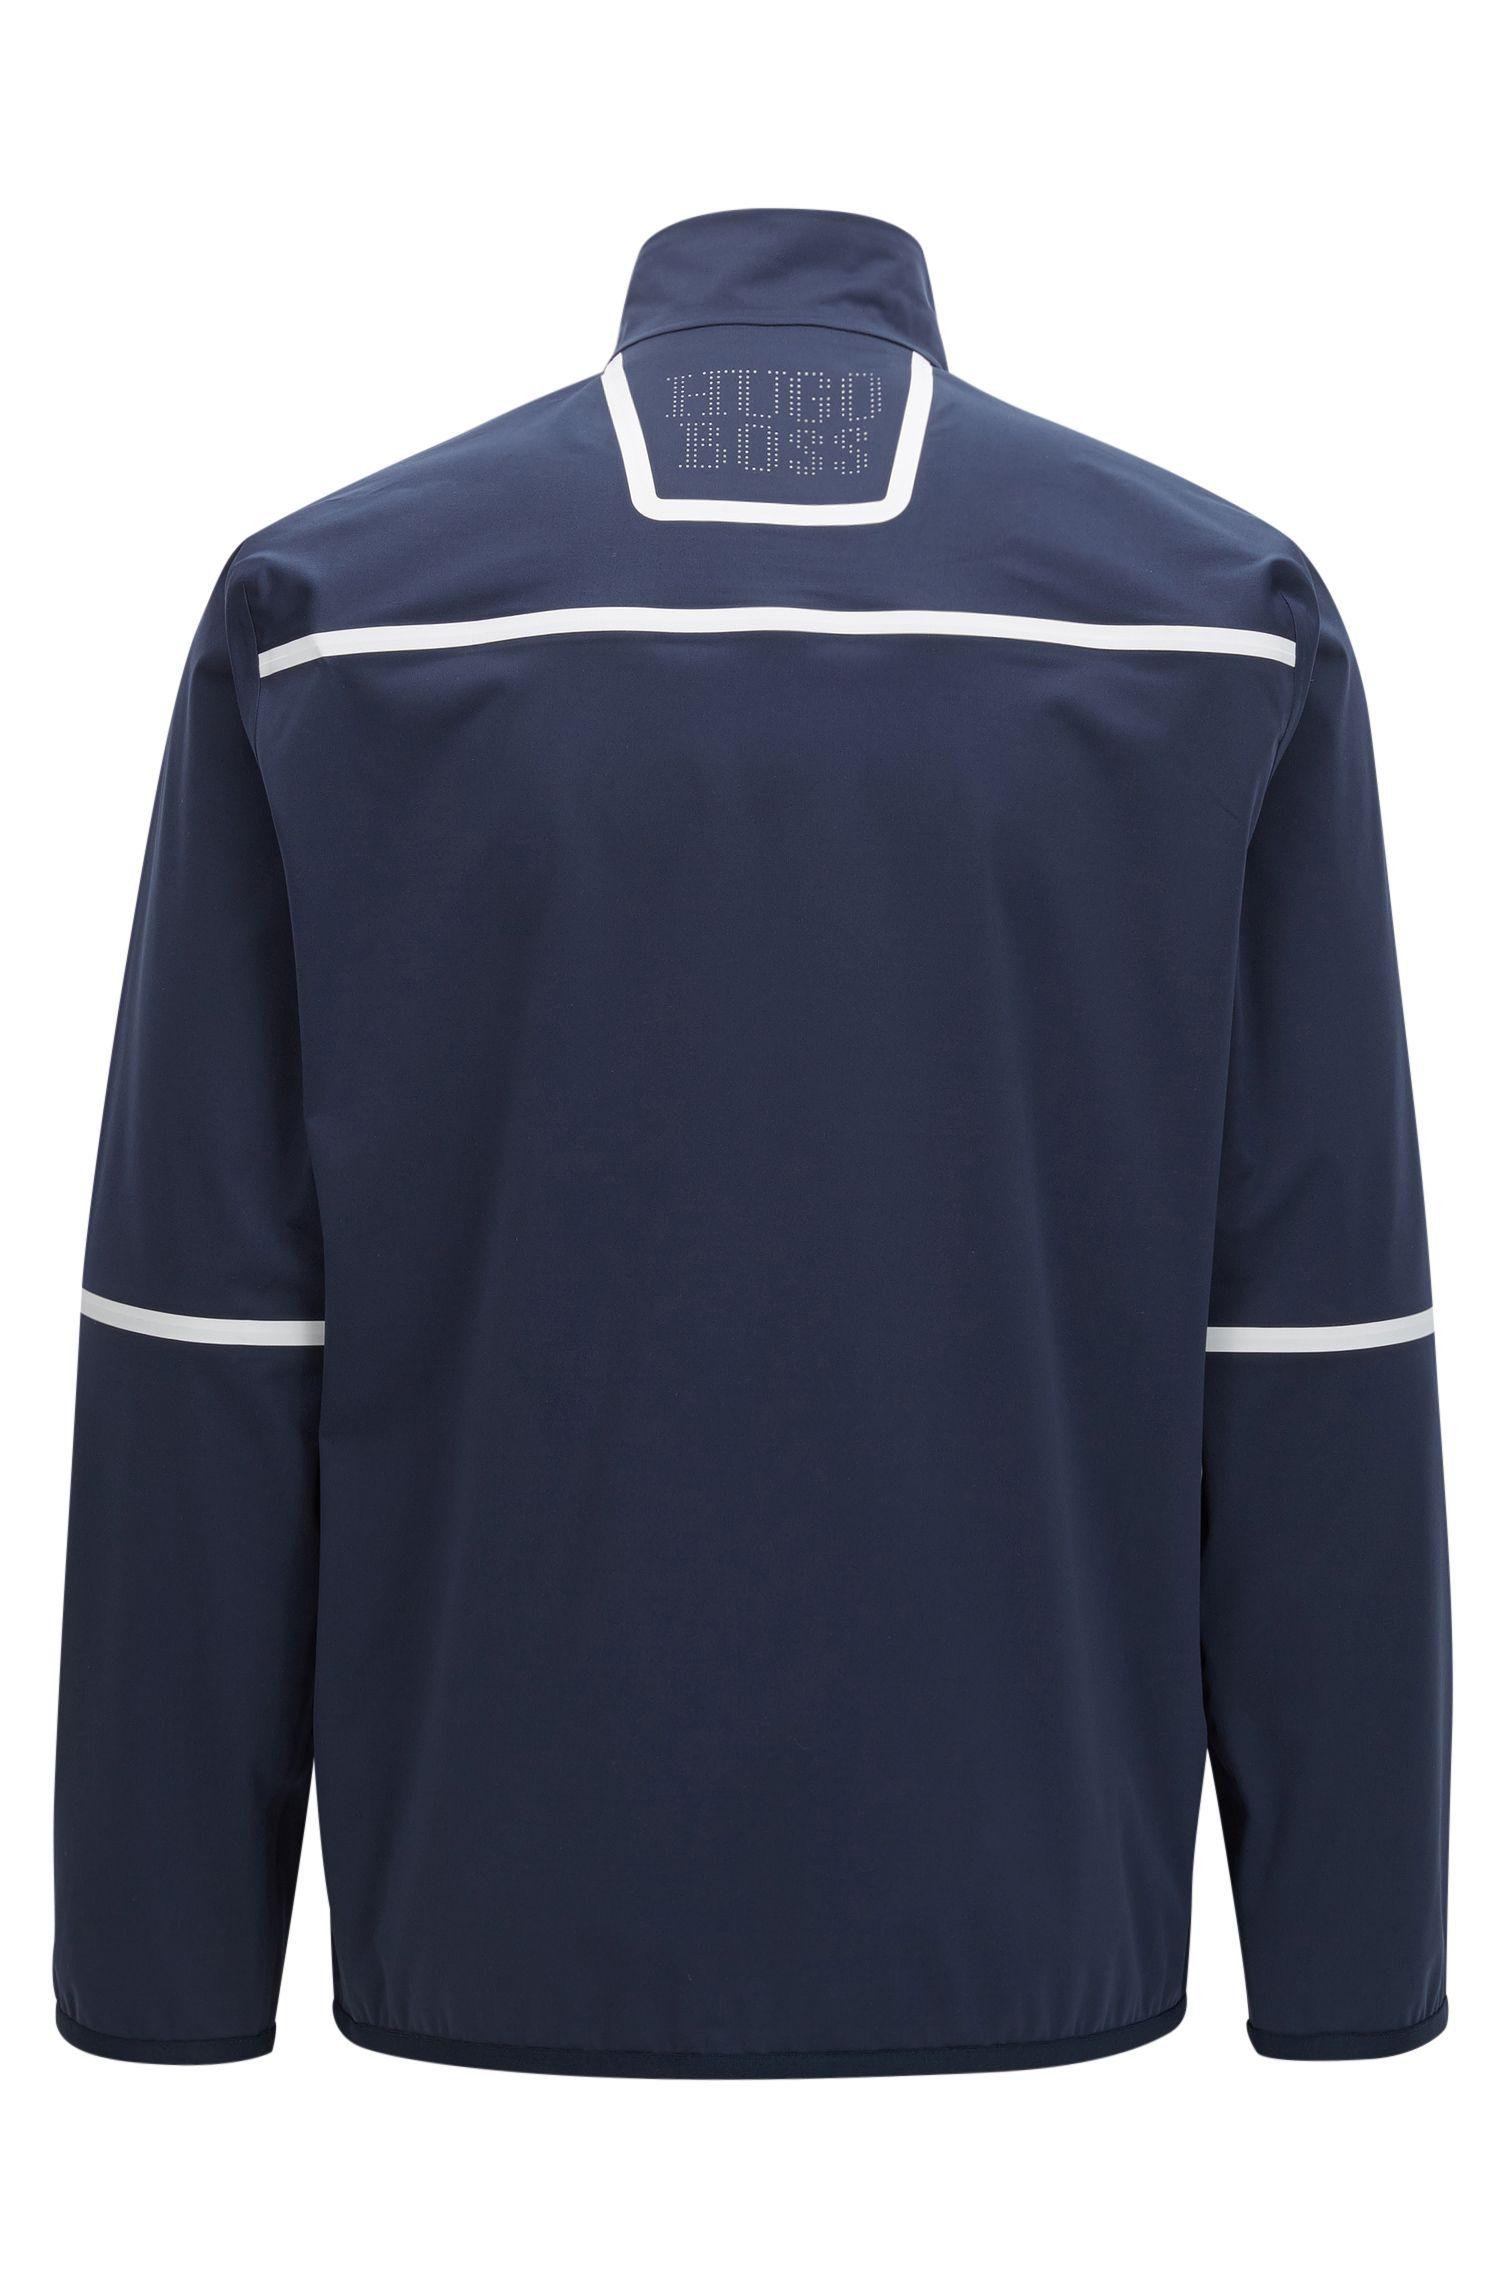 Zip-through jacket in S.Café® fabric